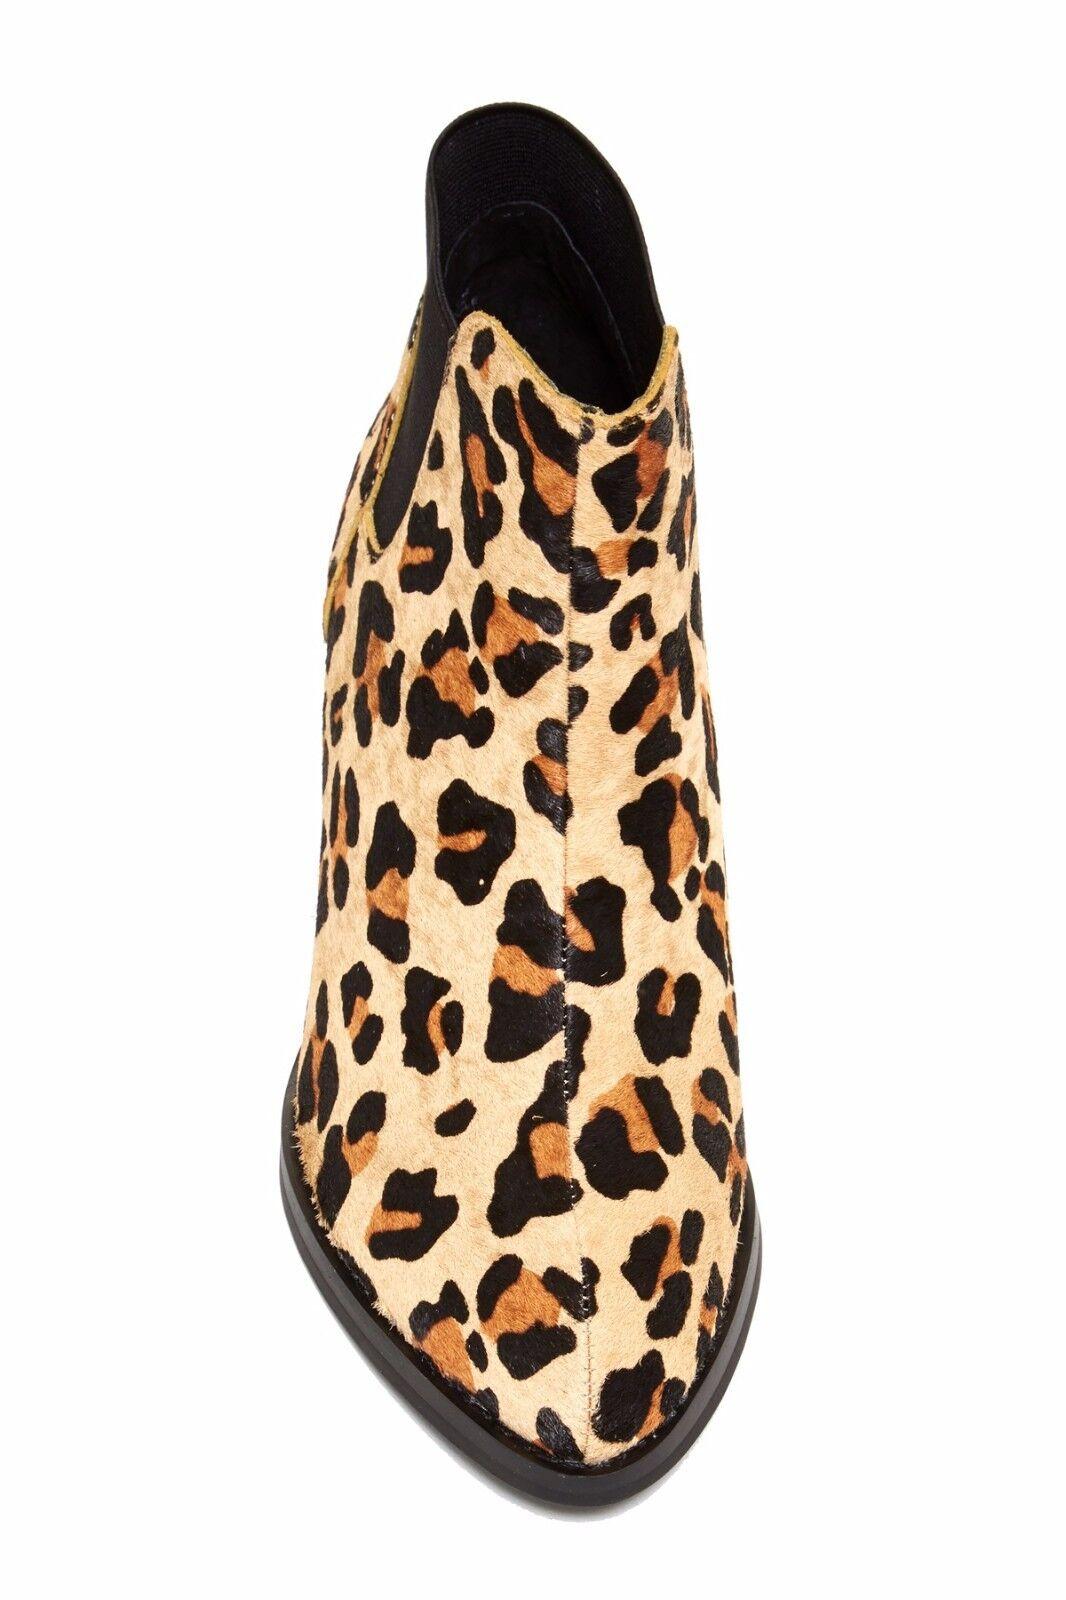 Nuevo teñido Steve Madden Palace Genuino teñido Nuevo pelo de vaca botas para mujer Talla 8.5 e34721